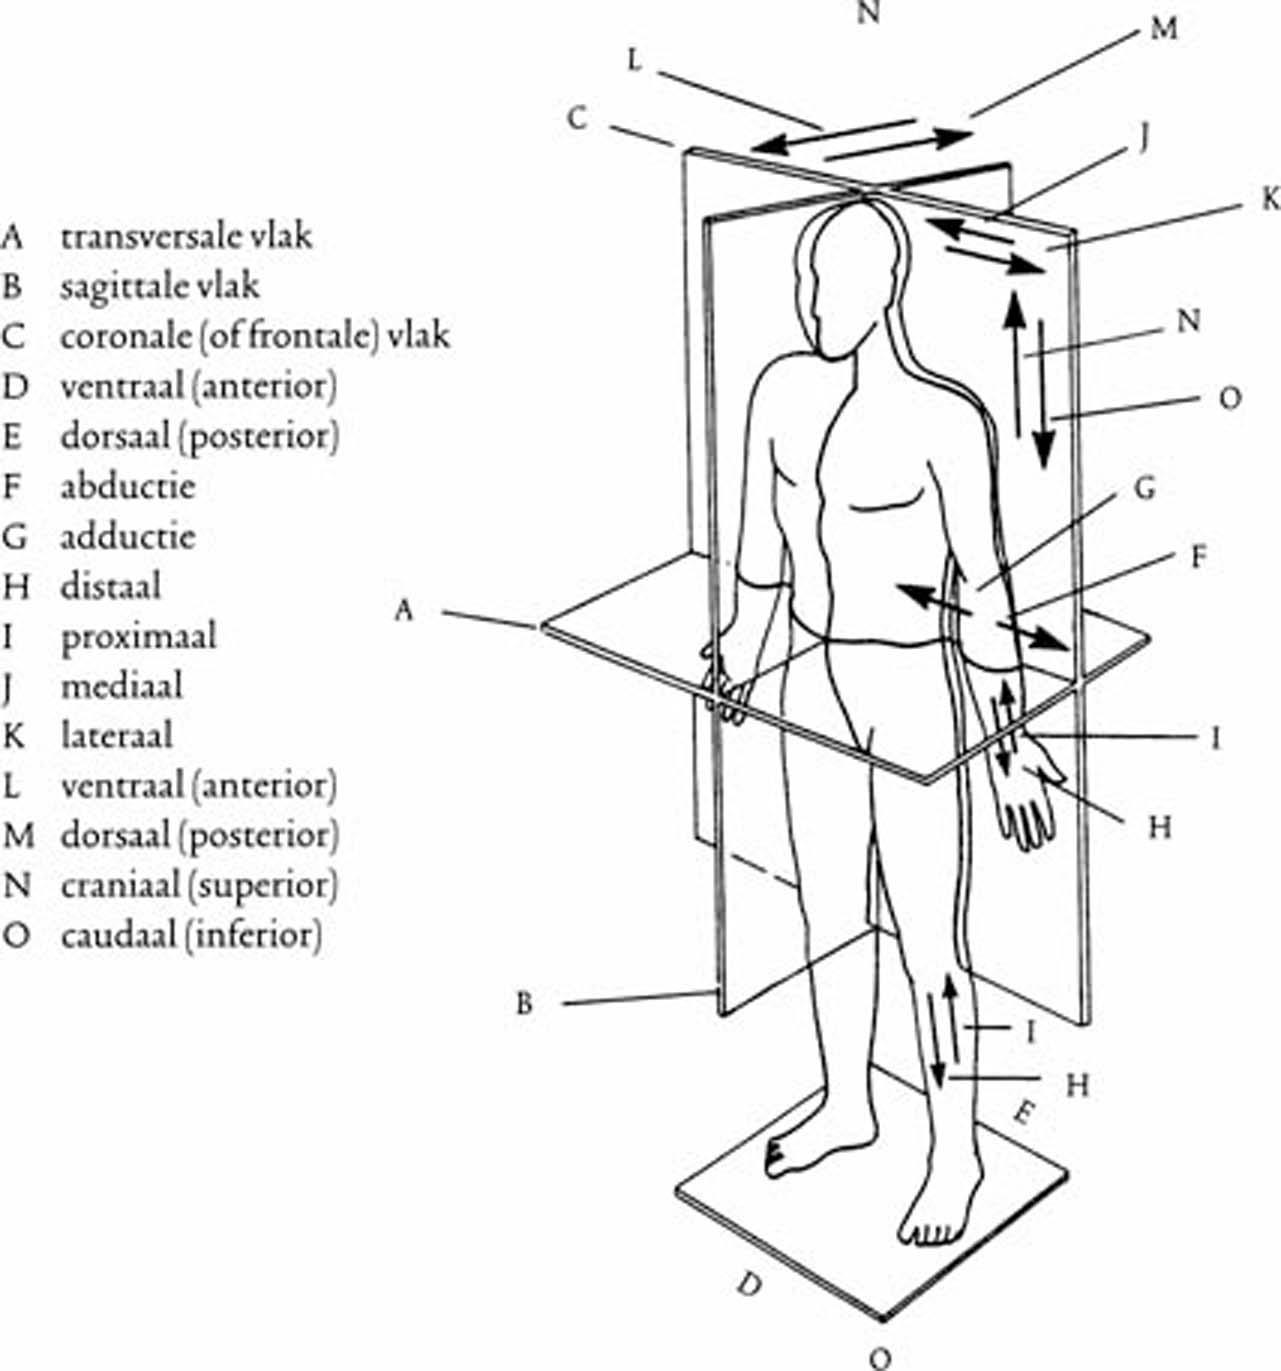 Perifere anatomie: ademapparaat en bovenste luchtwegen | SpringerLink